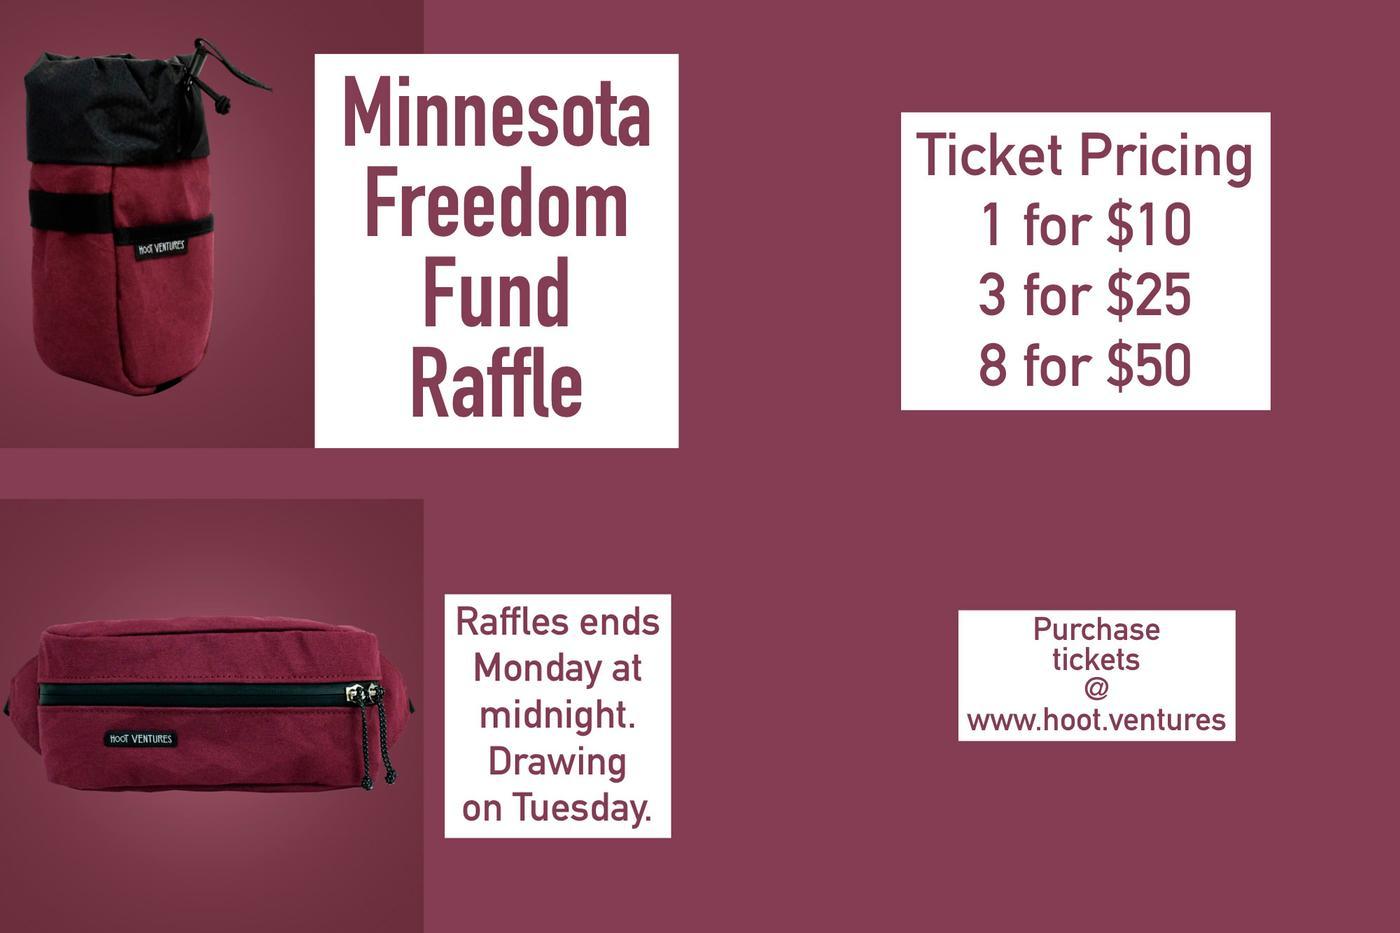 Hoot Ventures Minnesota Freedom Fund Raffle